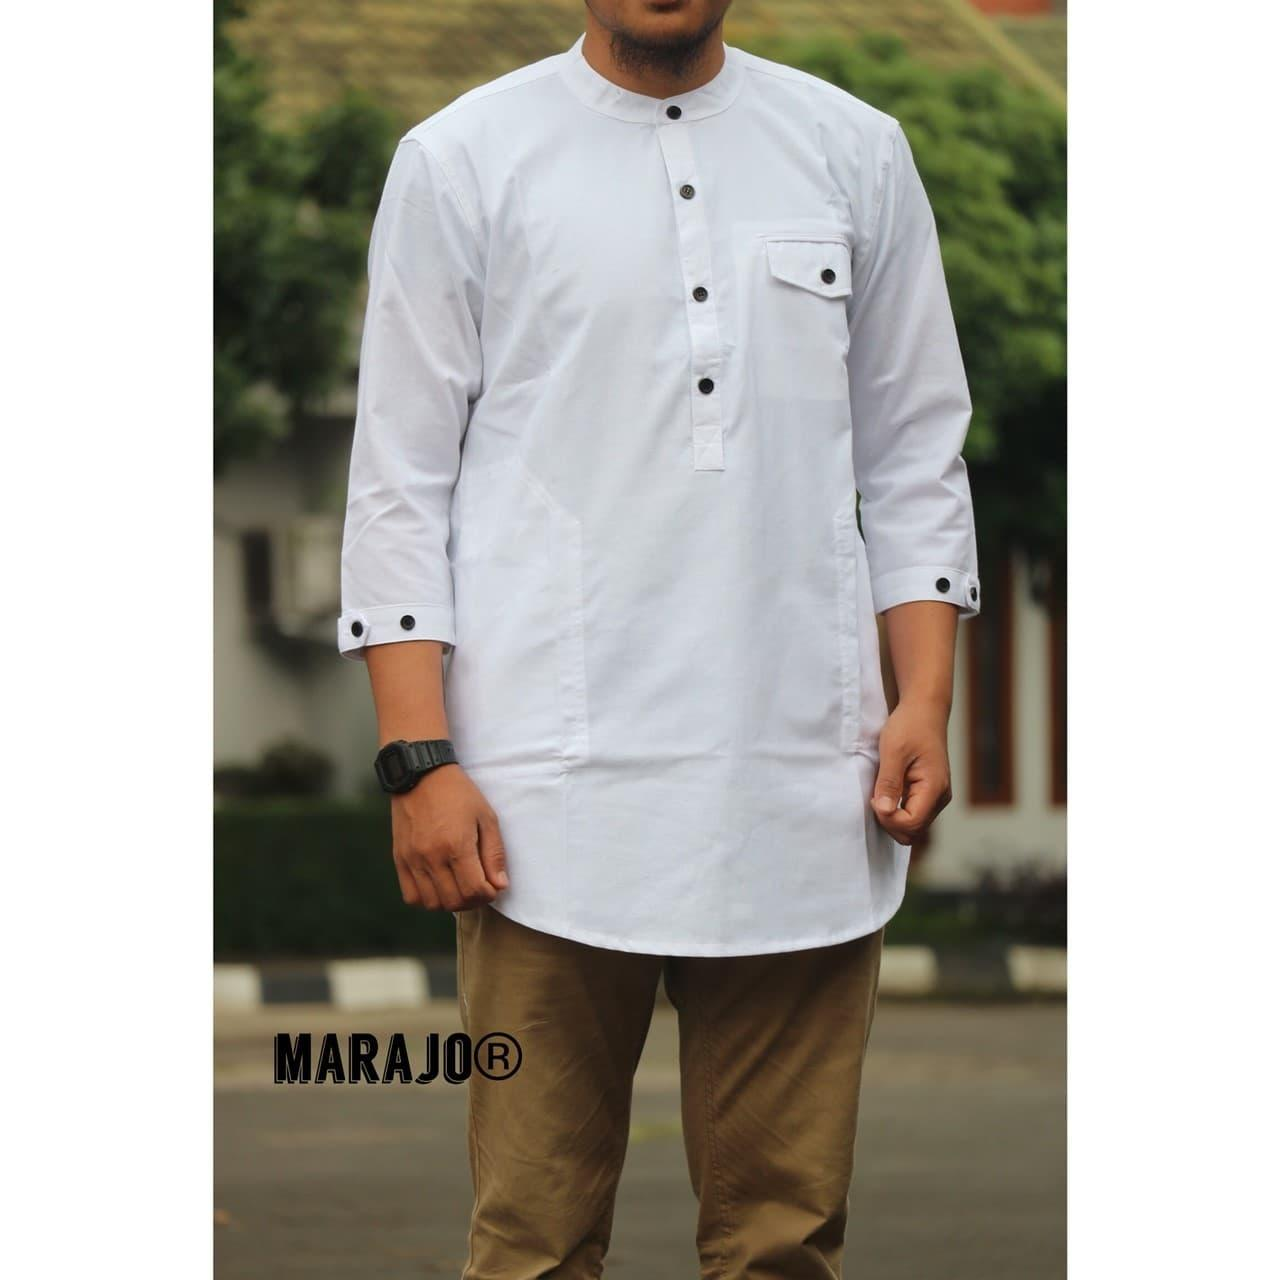 Baju Pria Kemeja Baju Koko Gaul Qurta Original Marajo Putih Polos